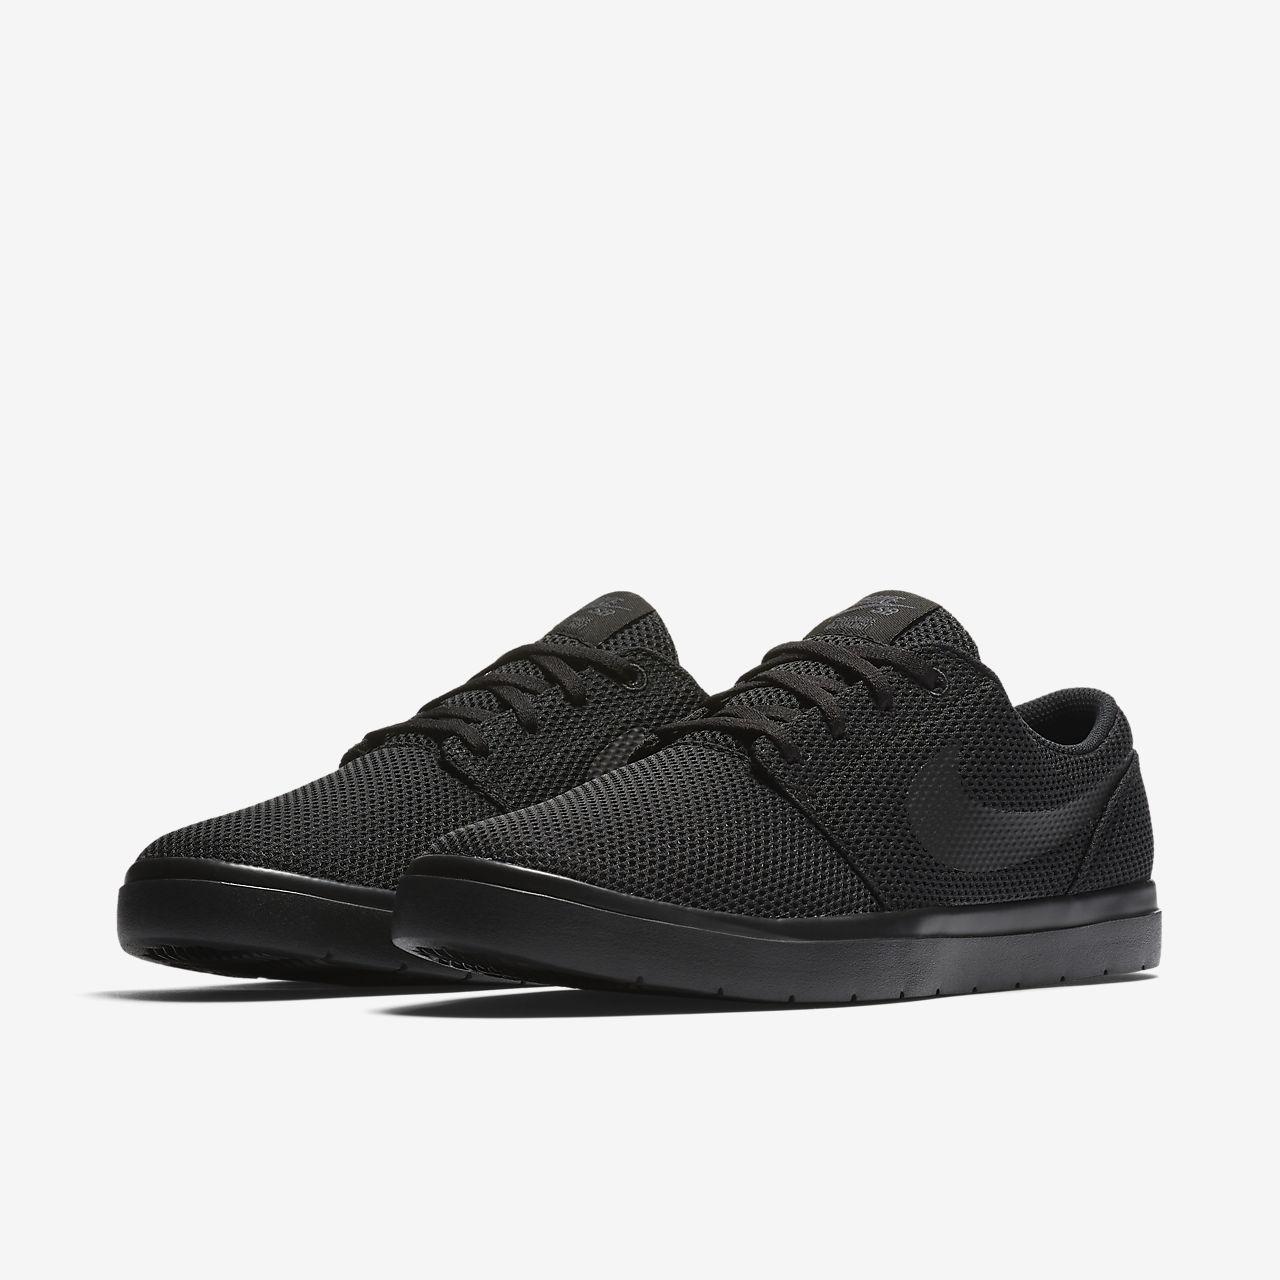 928d5767aae3e Nike SB Portmore II Ultralight Men's Skateboarding Shoe